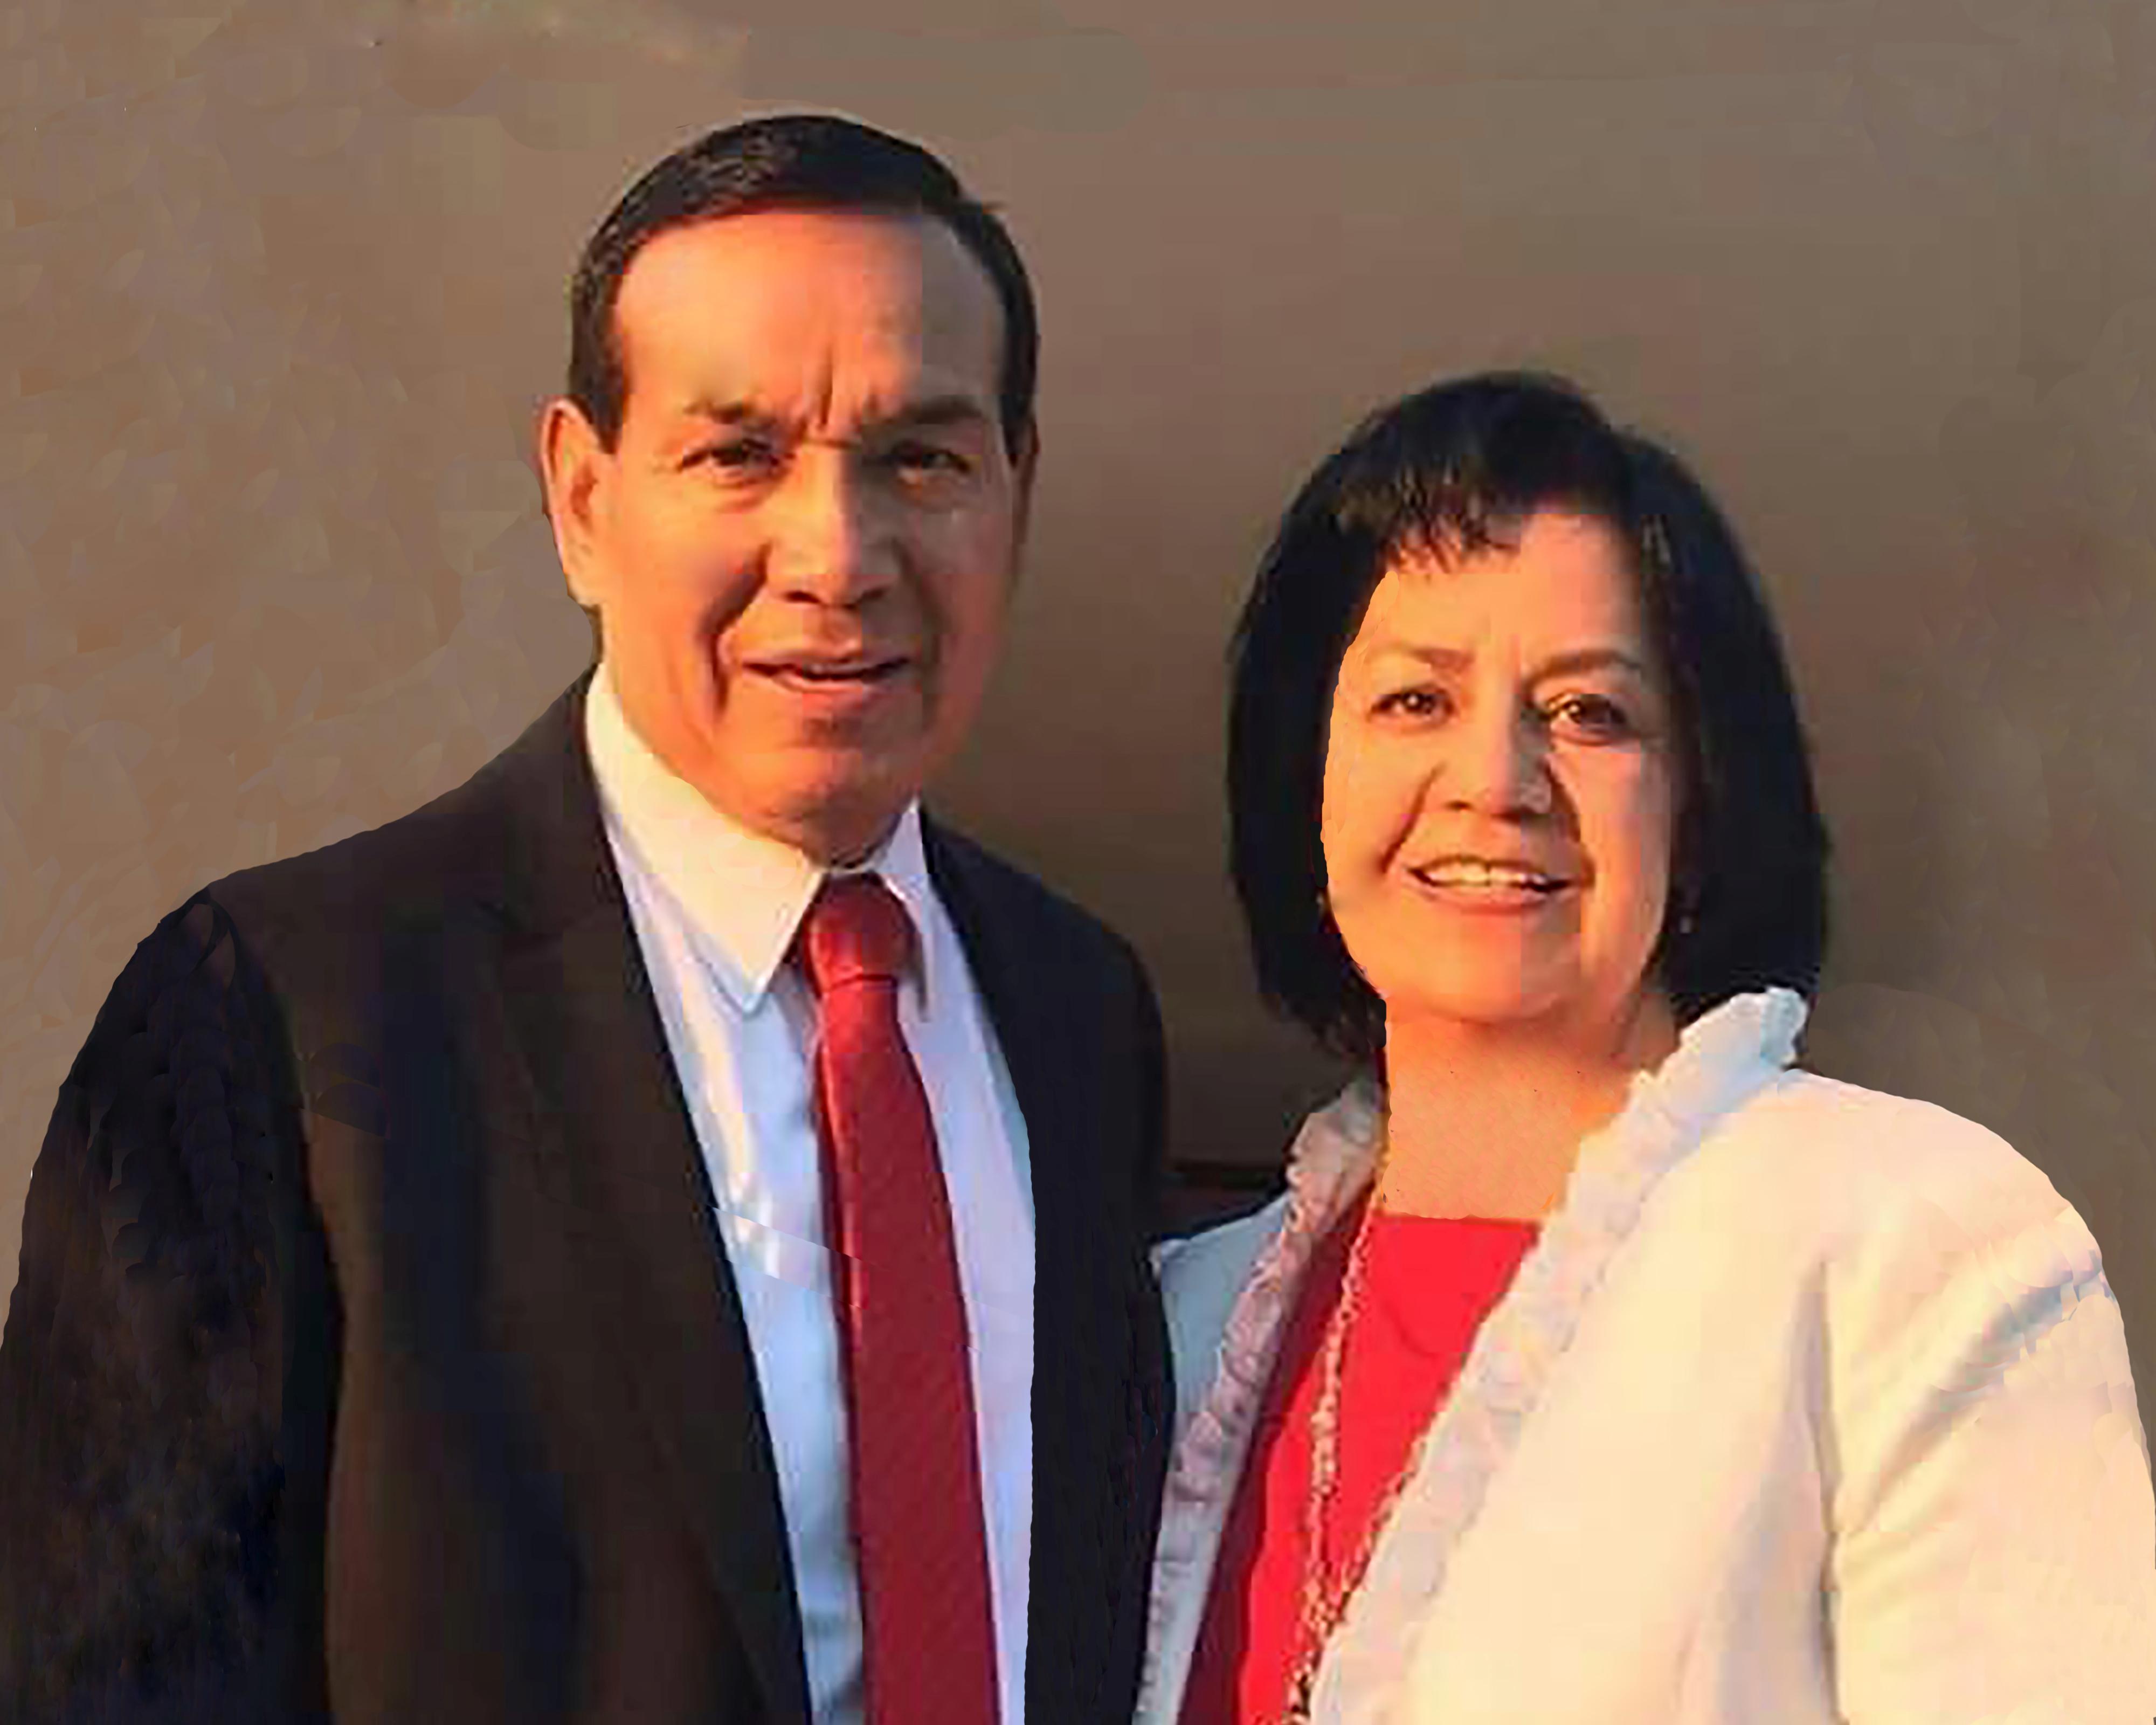 Abraham and Virginia M. Martínez